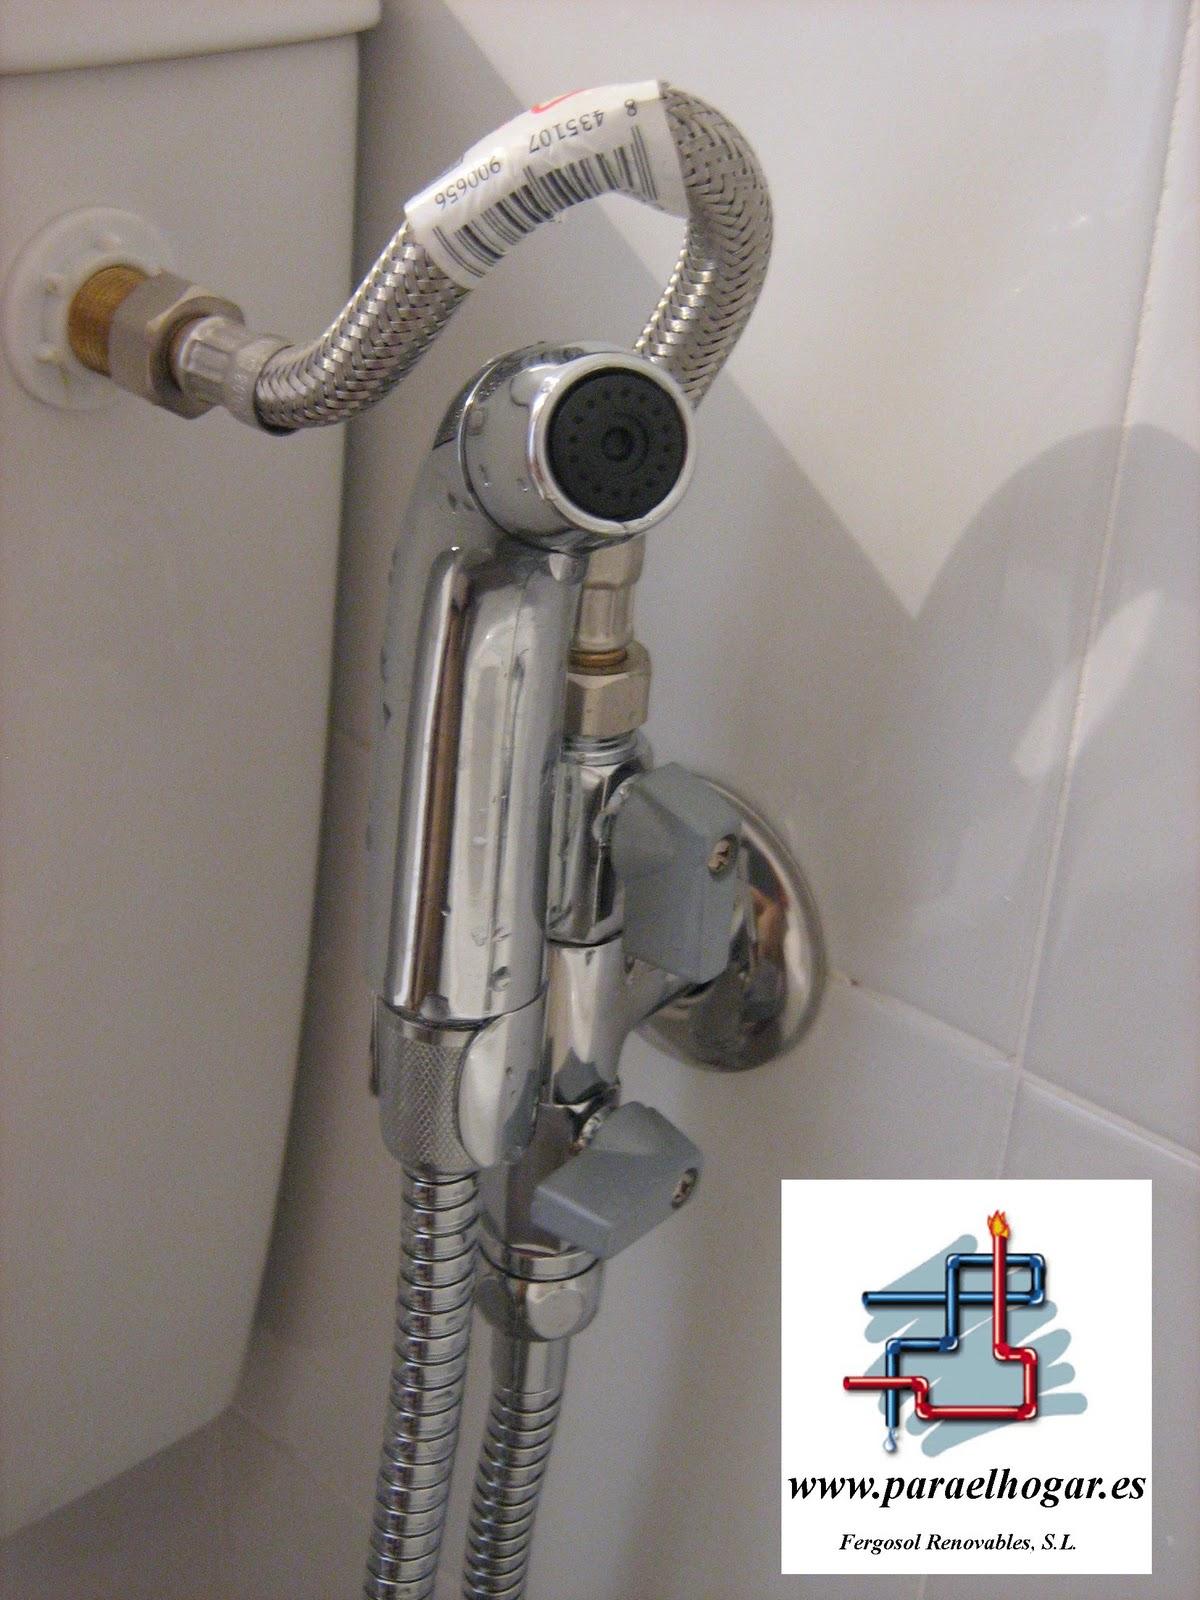 Pumps tubos termo boiler grifo sustituto de bidet - Grifo bidet para wc ...